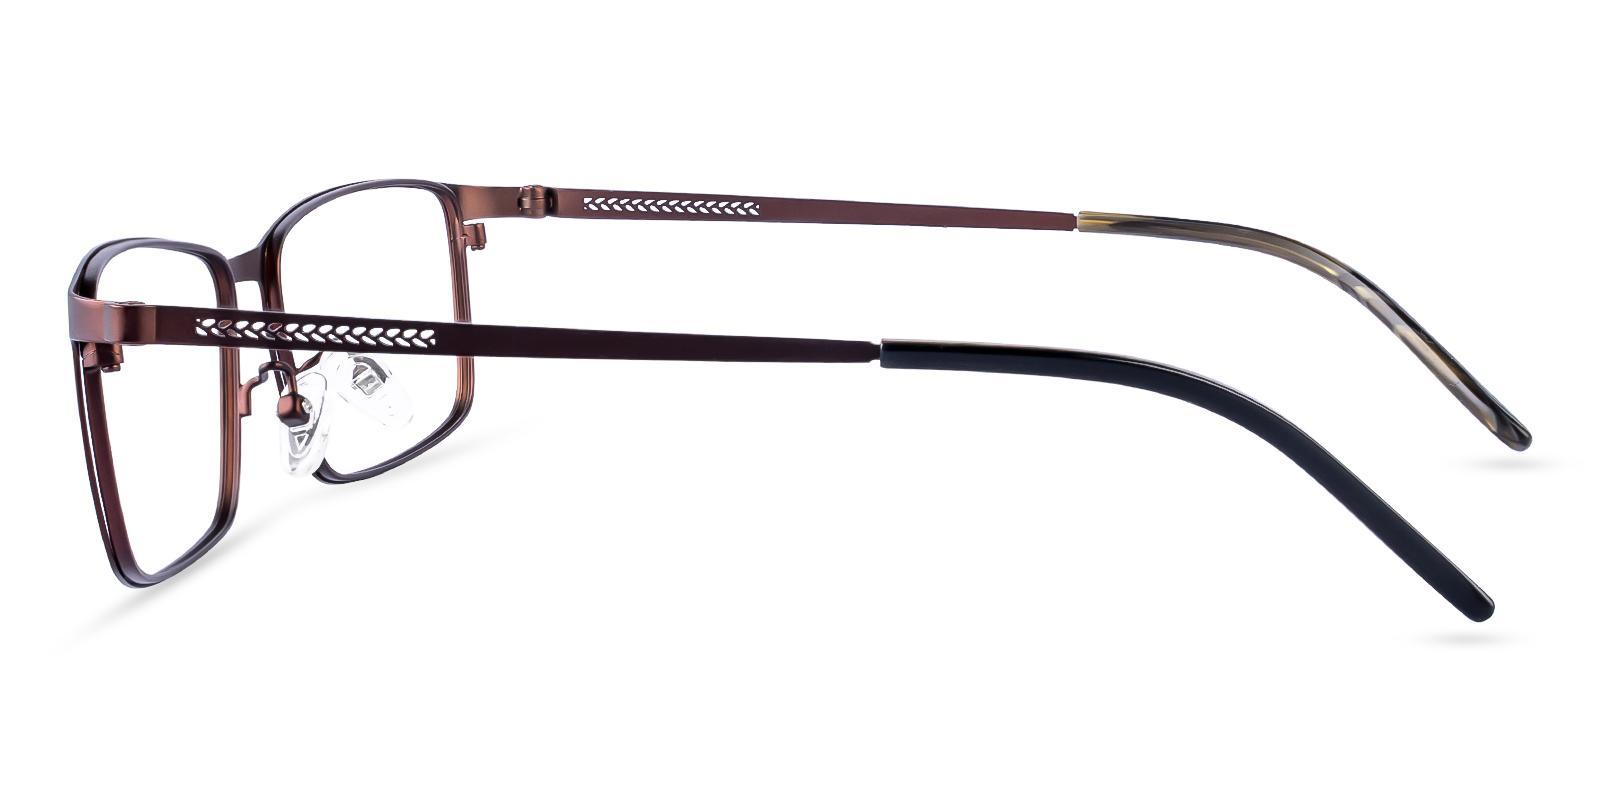 Daniel Brown Metal Eyeglasses , NosePads Frames from ABBE Glasses